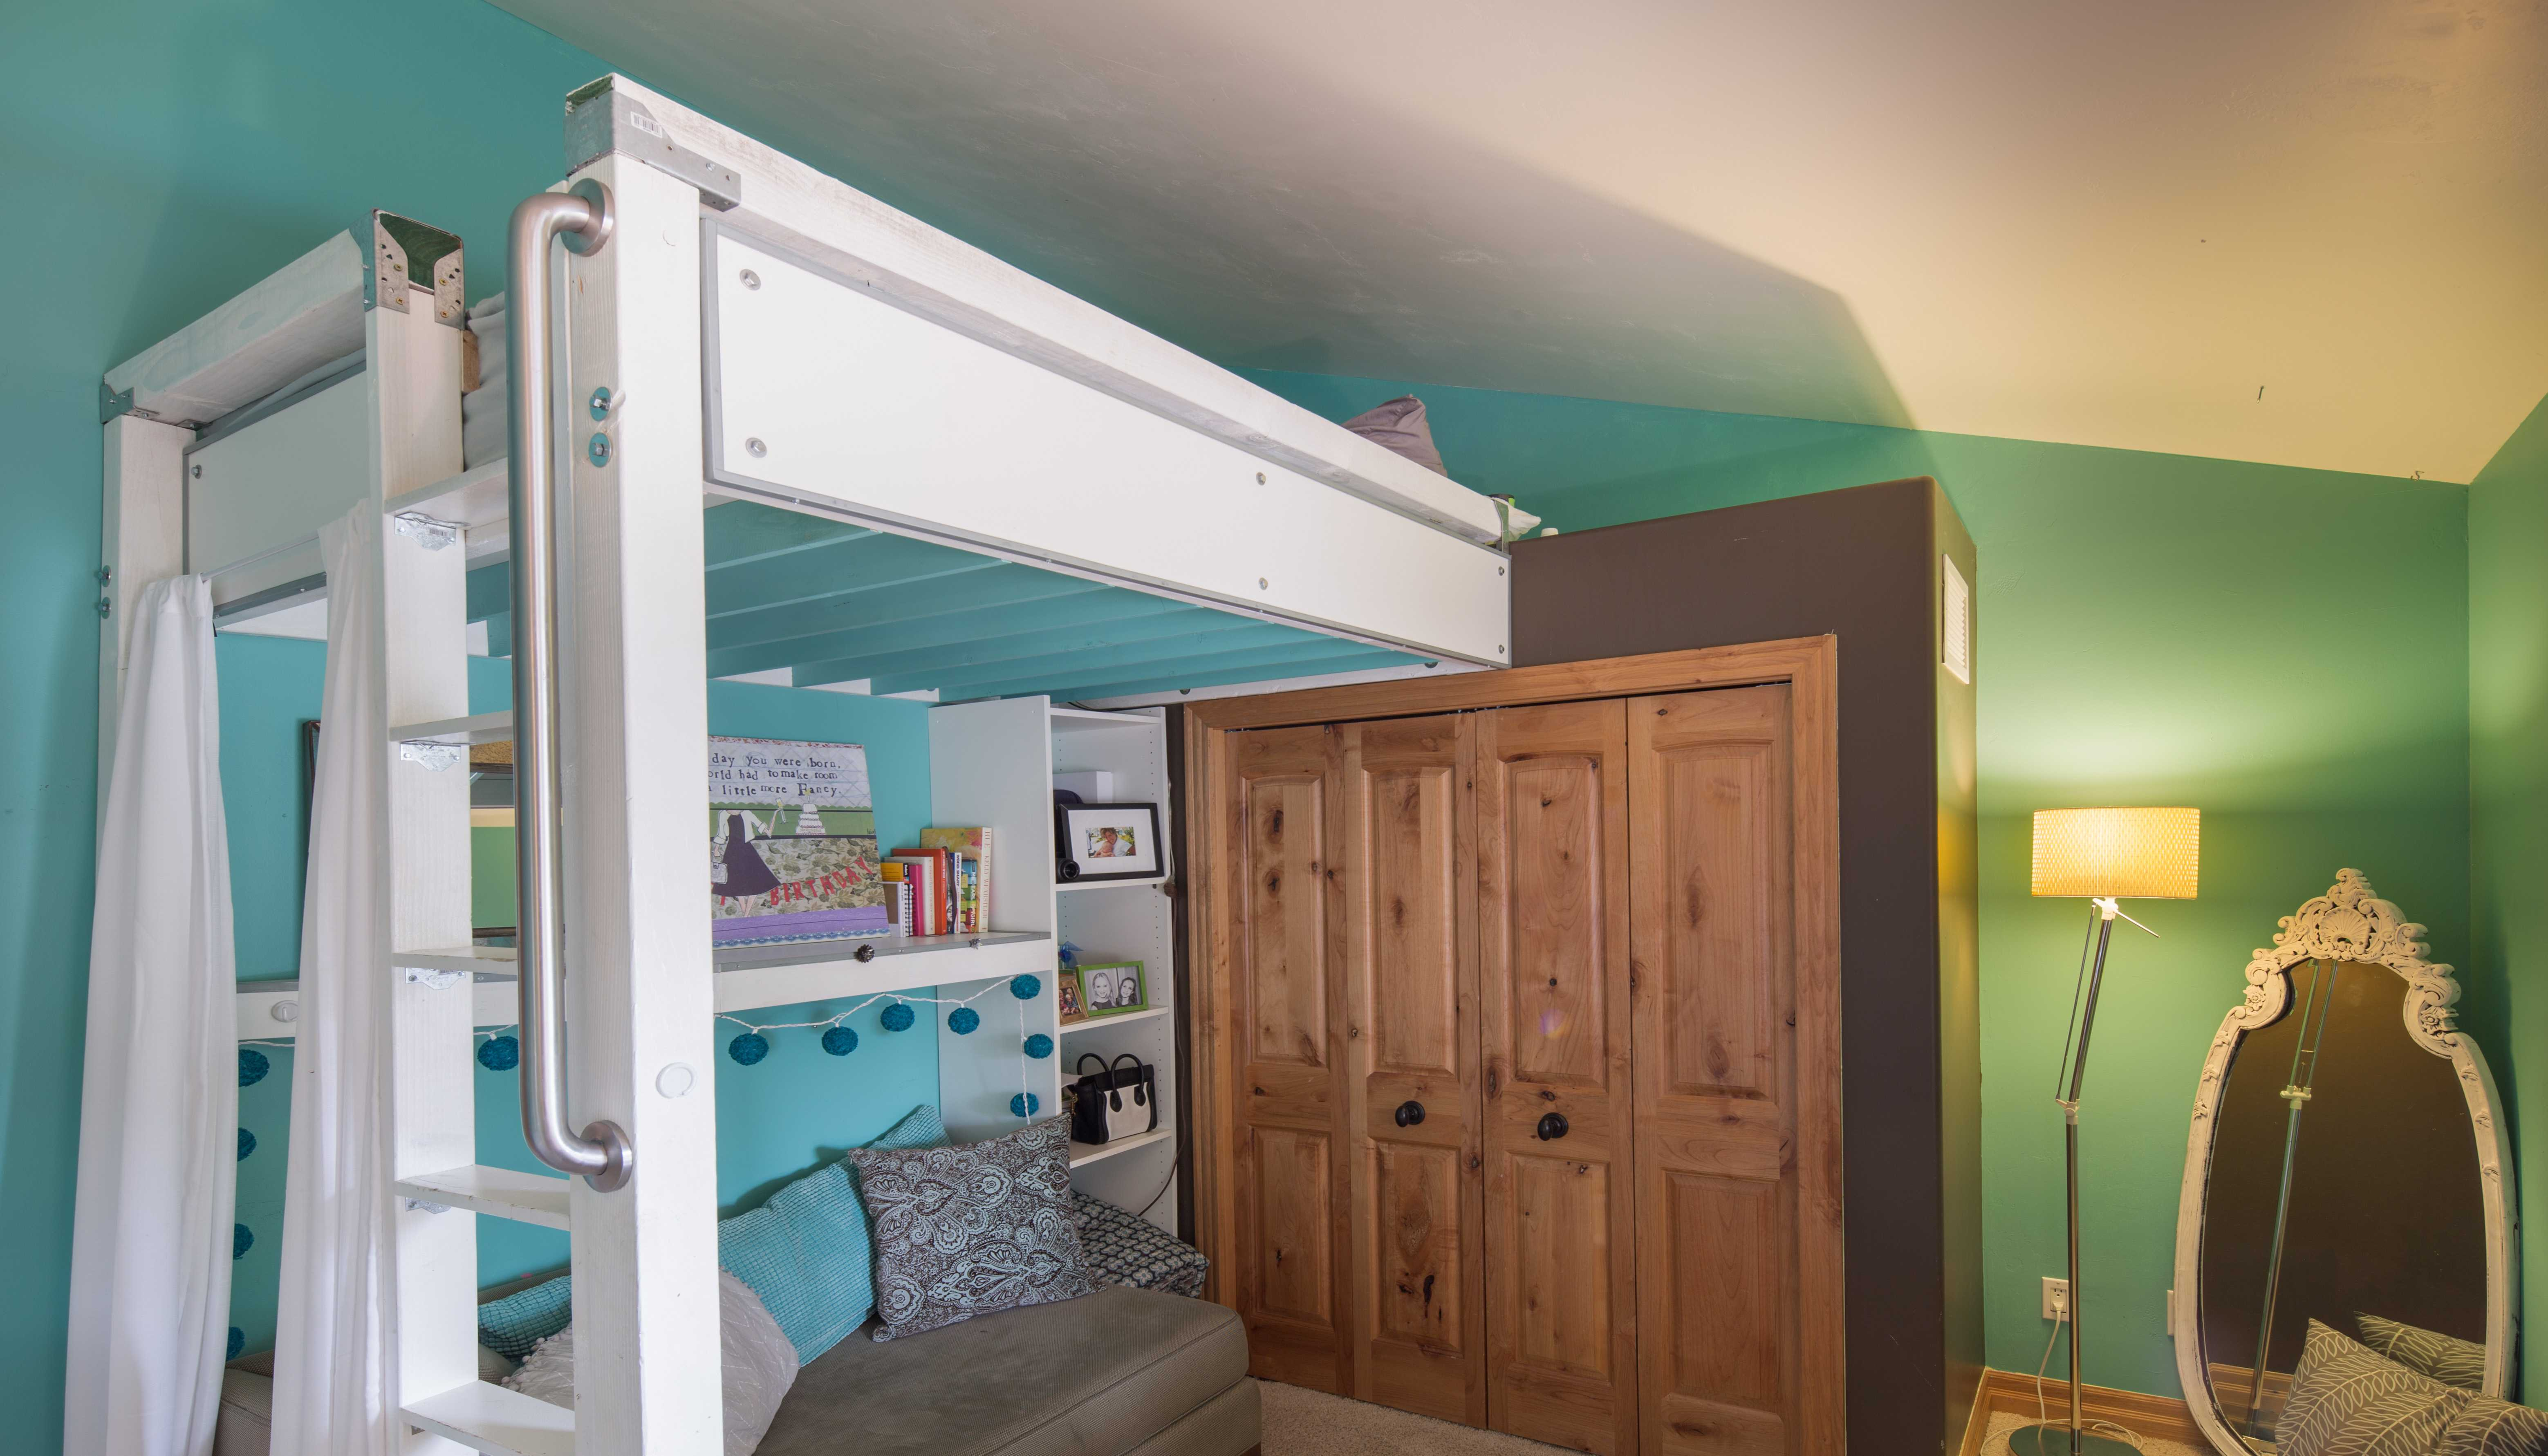 Additional photo for property listing at Luxury Living 119 Dollar Drive Ketchum, Idaho 83340 Estados Unidos